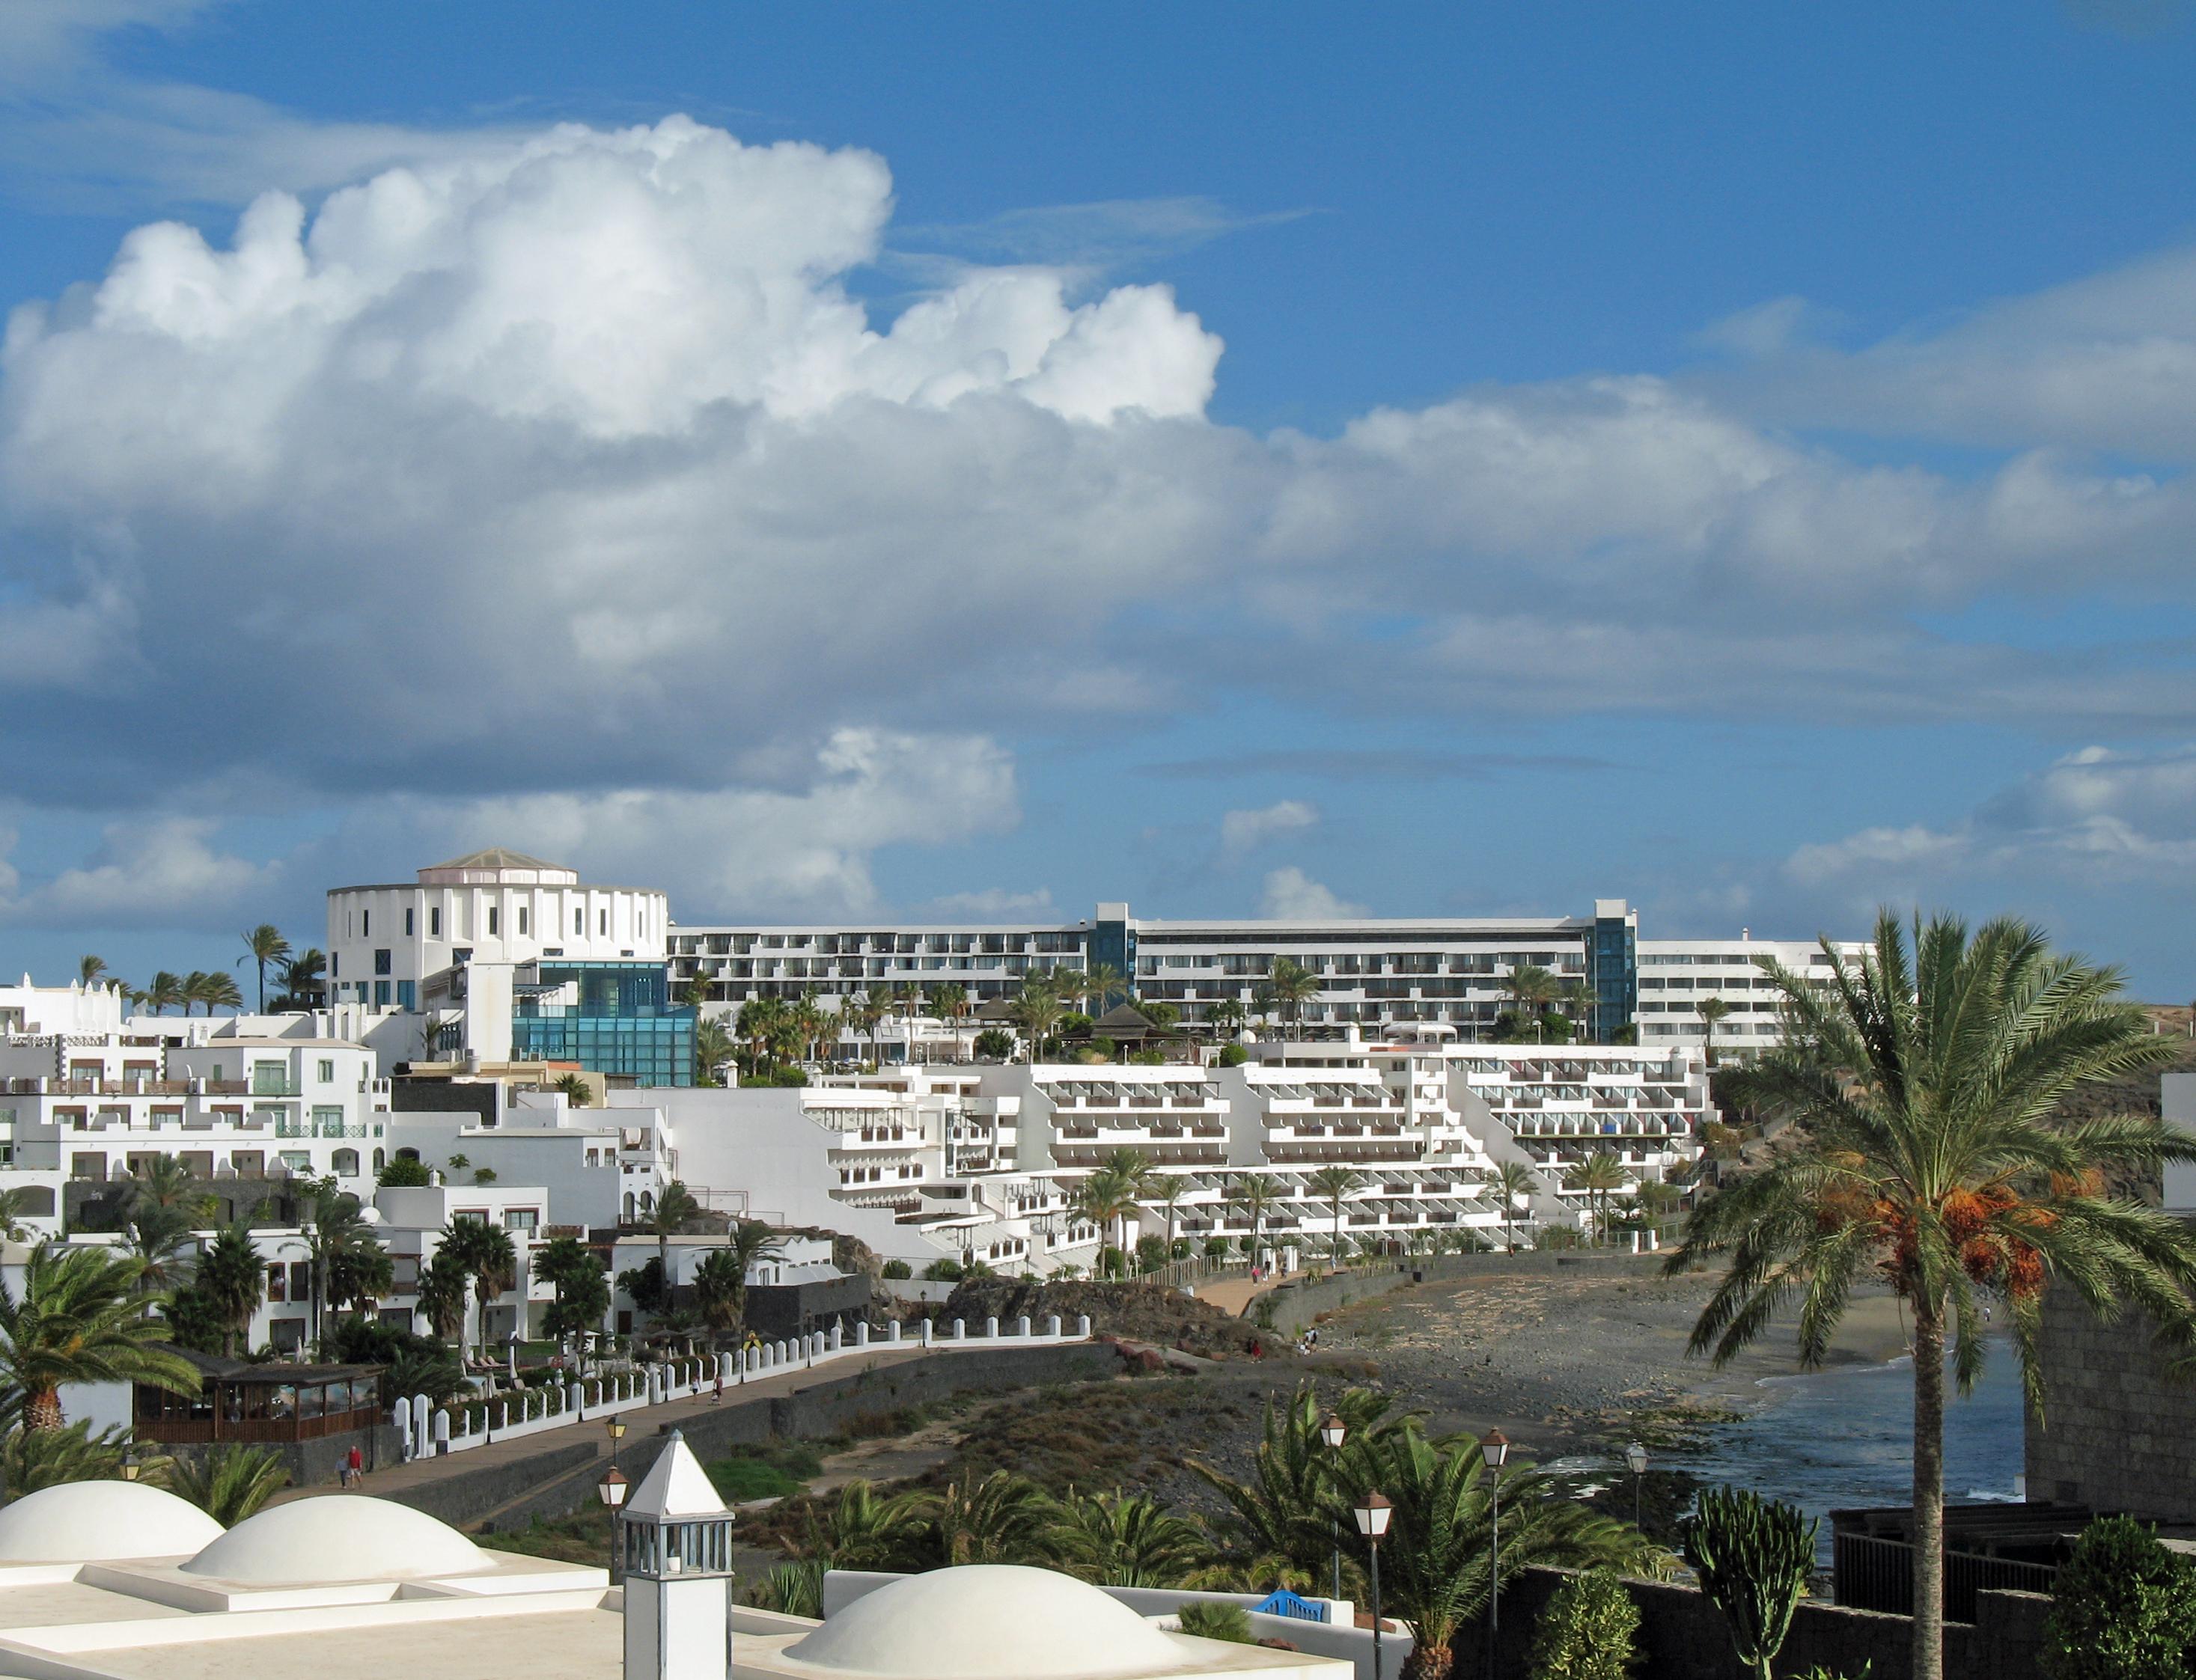 La playa resort a luxury naples florida beach resort for Hotels 02 arena